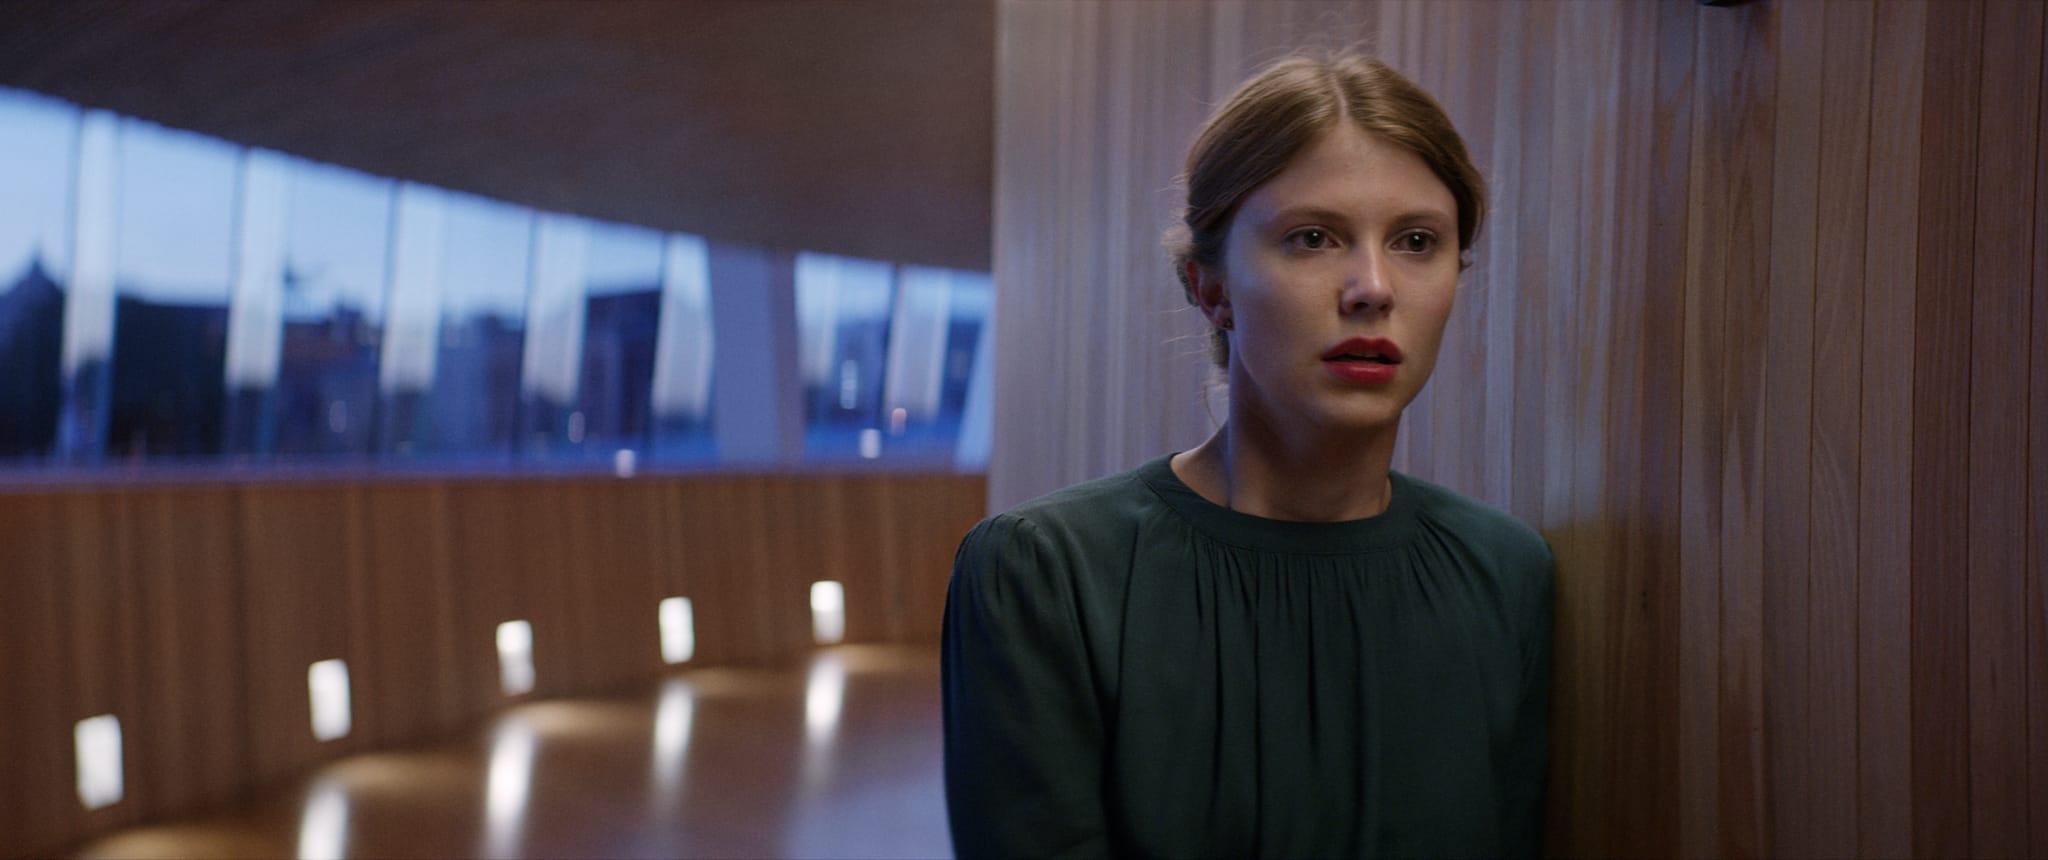 Thelma de Joachim Trier image film cinéma